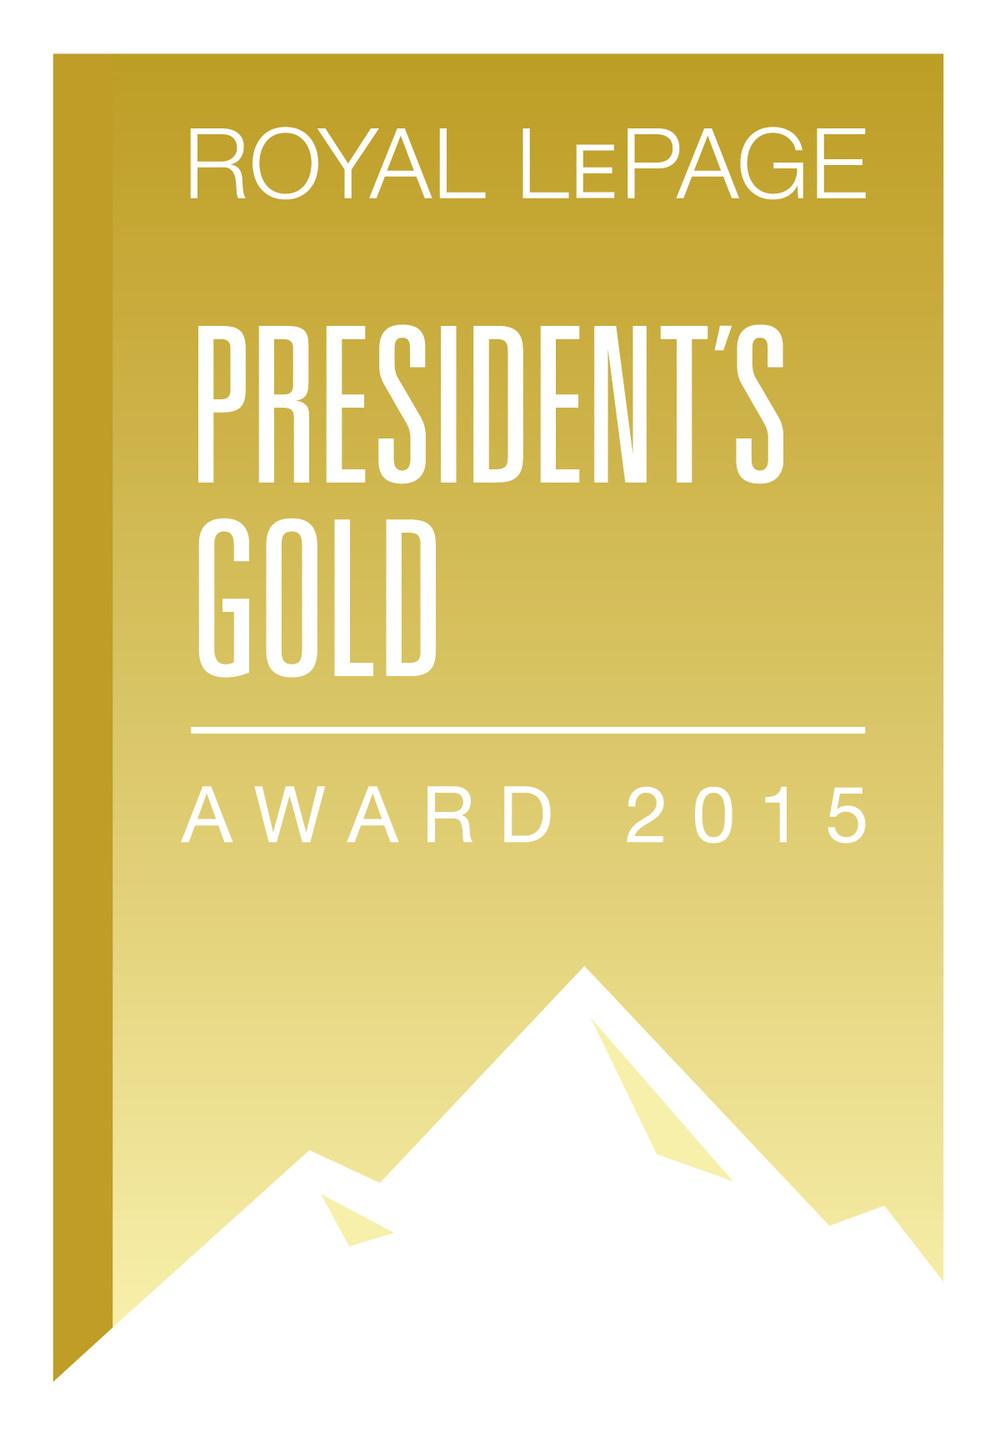 RLP-PresidentGold-2015-EN-CMYK.jpg